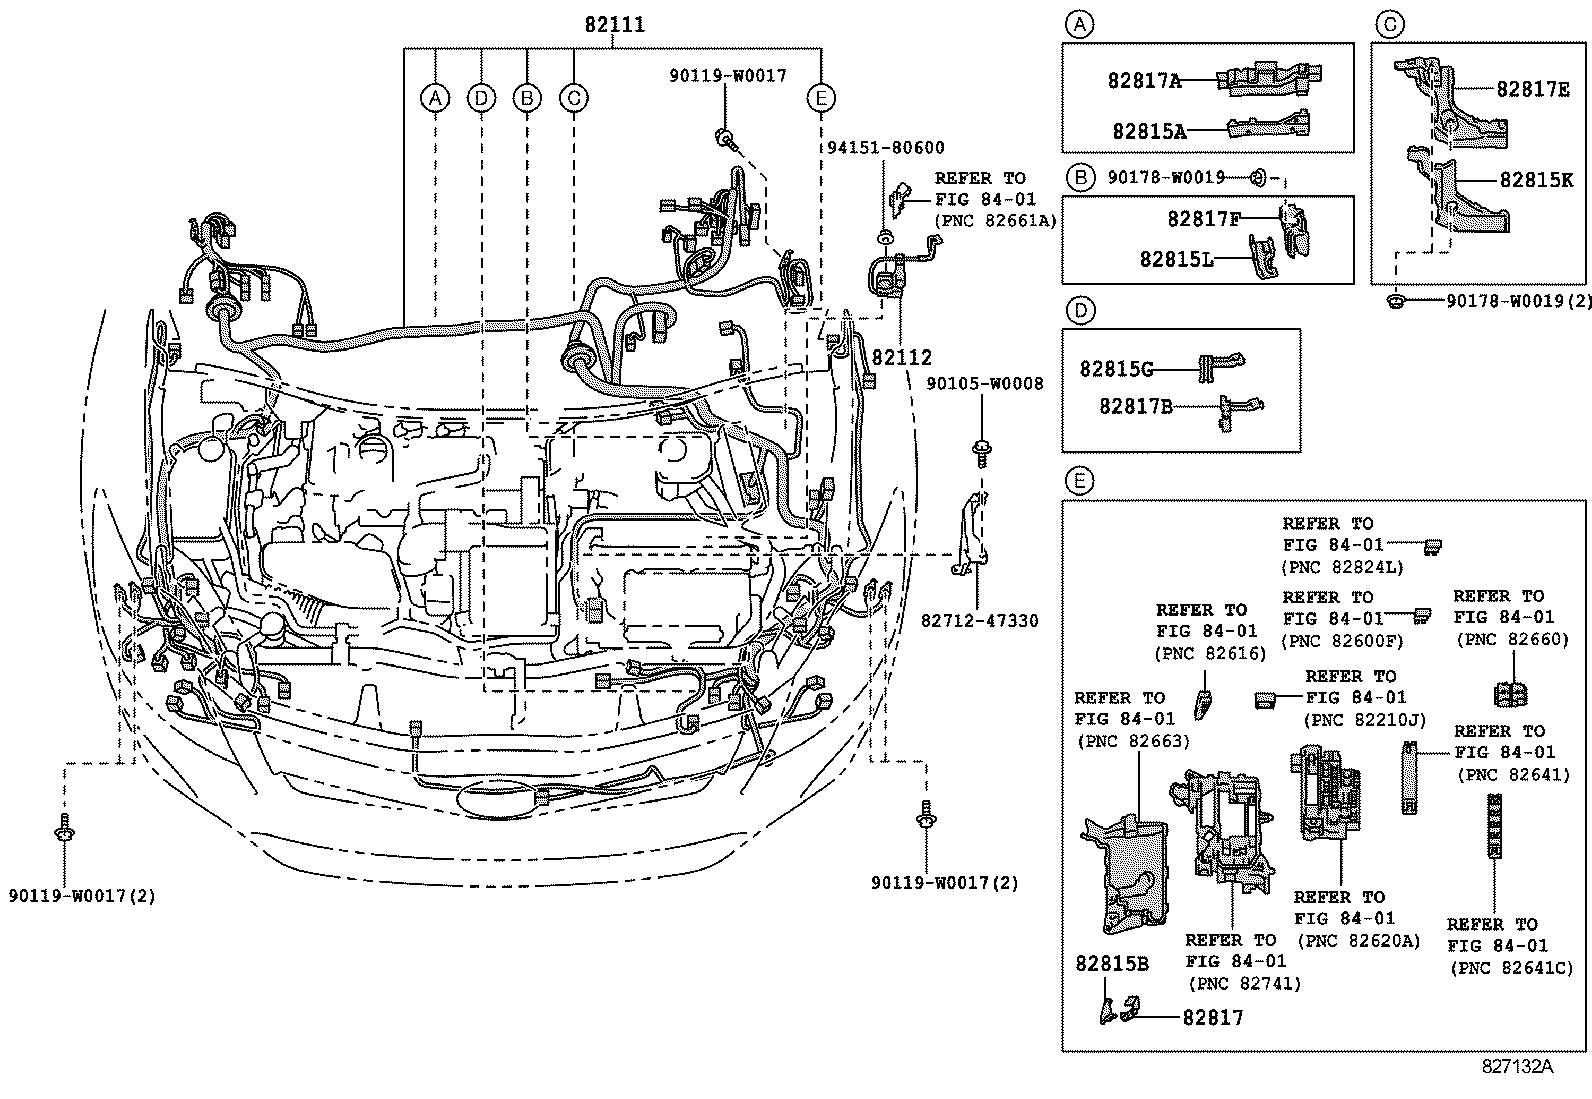 toyota auris hybridzwe150l-dhxgbw - electrical